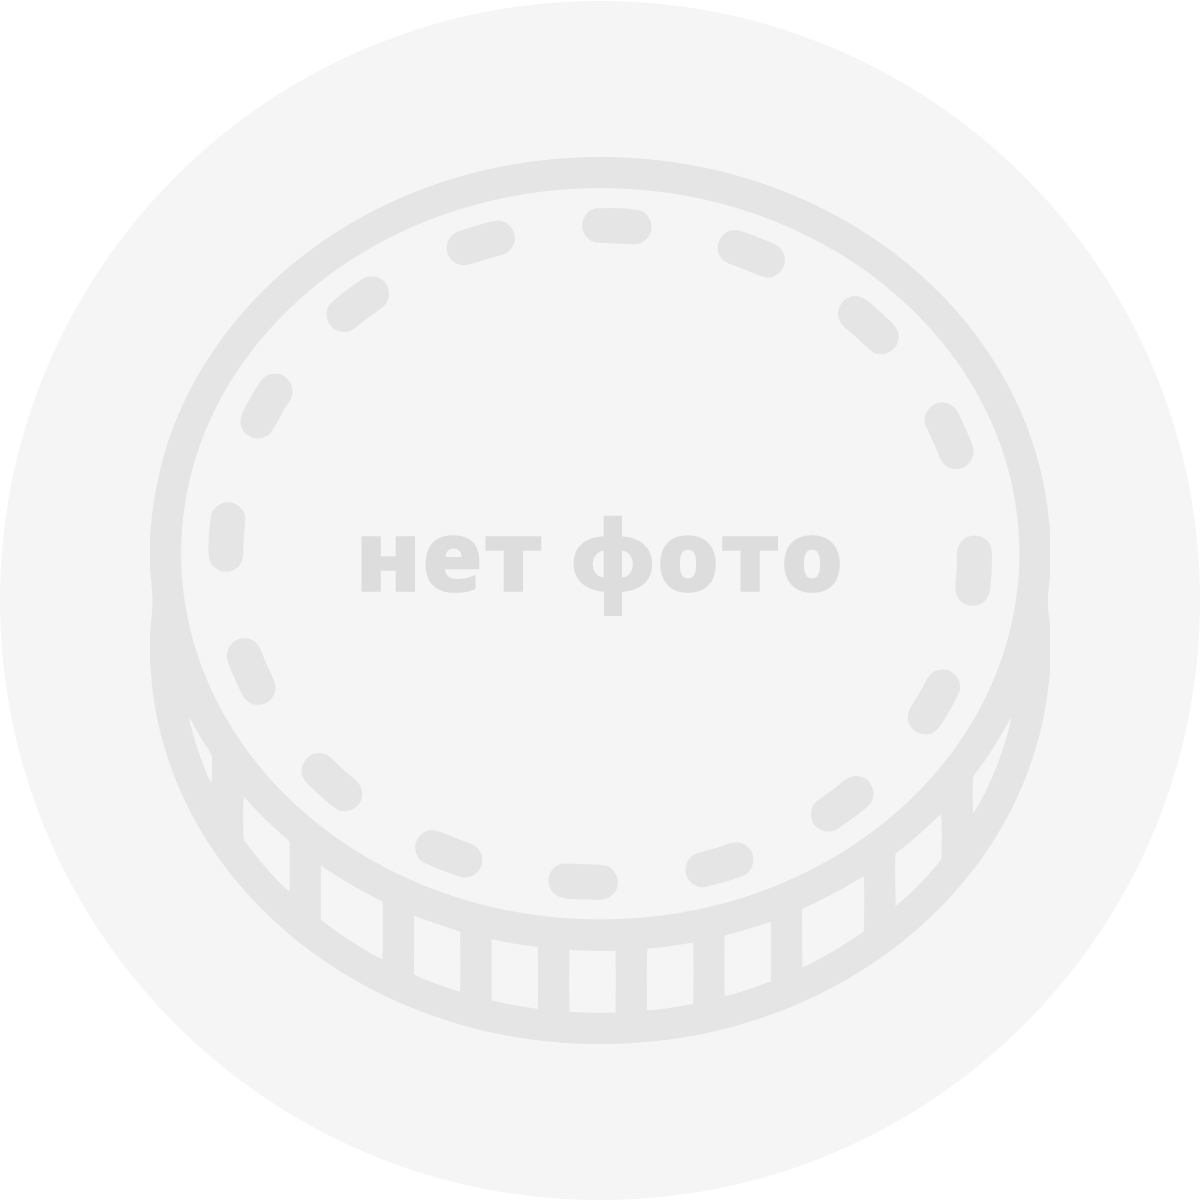 Теркс и Кайкос, 25 крон (2000 г.)